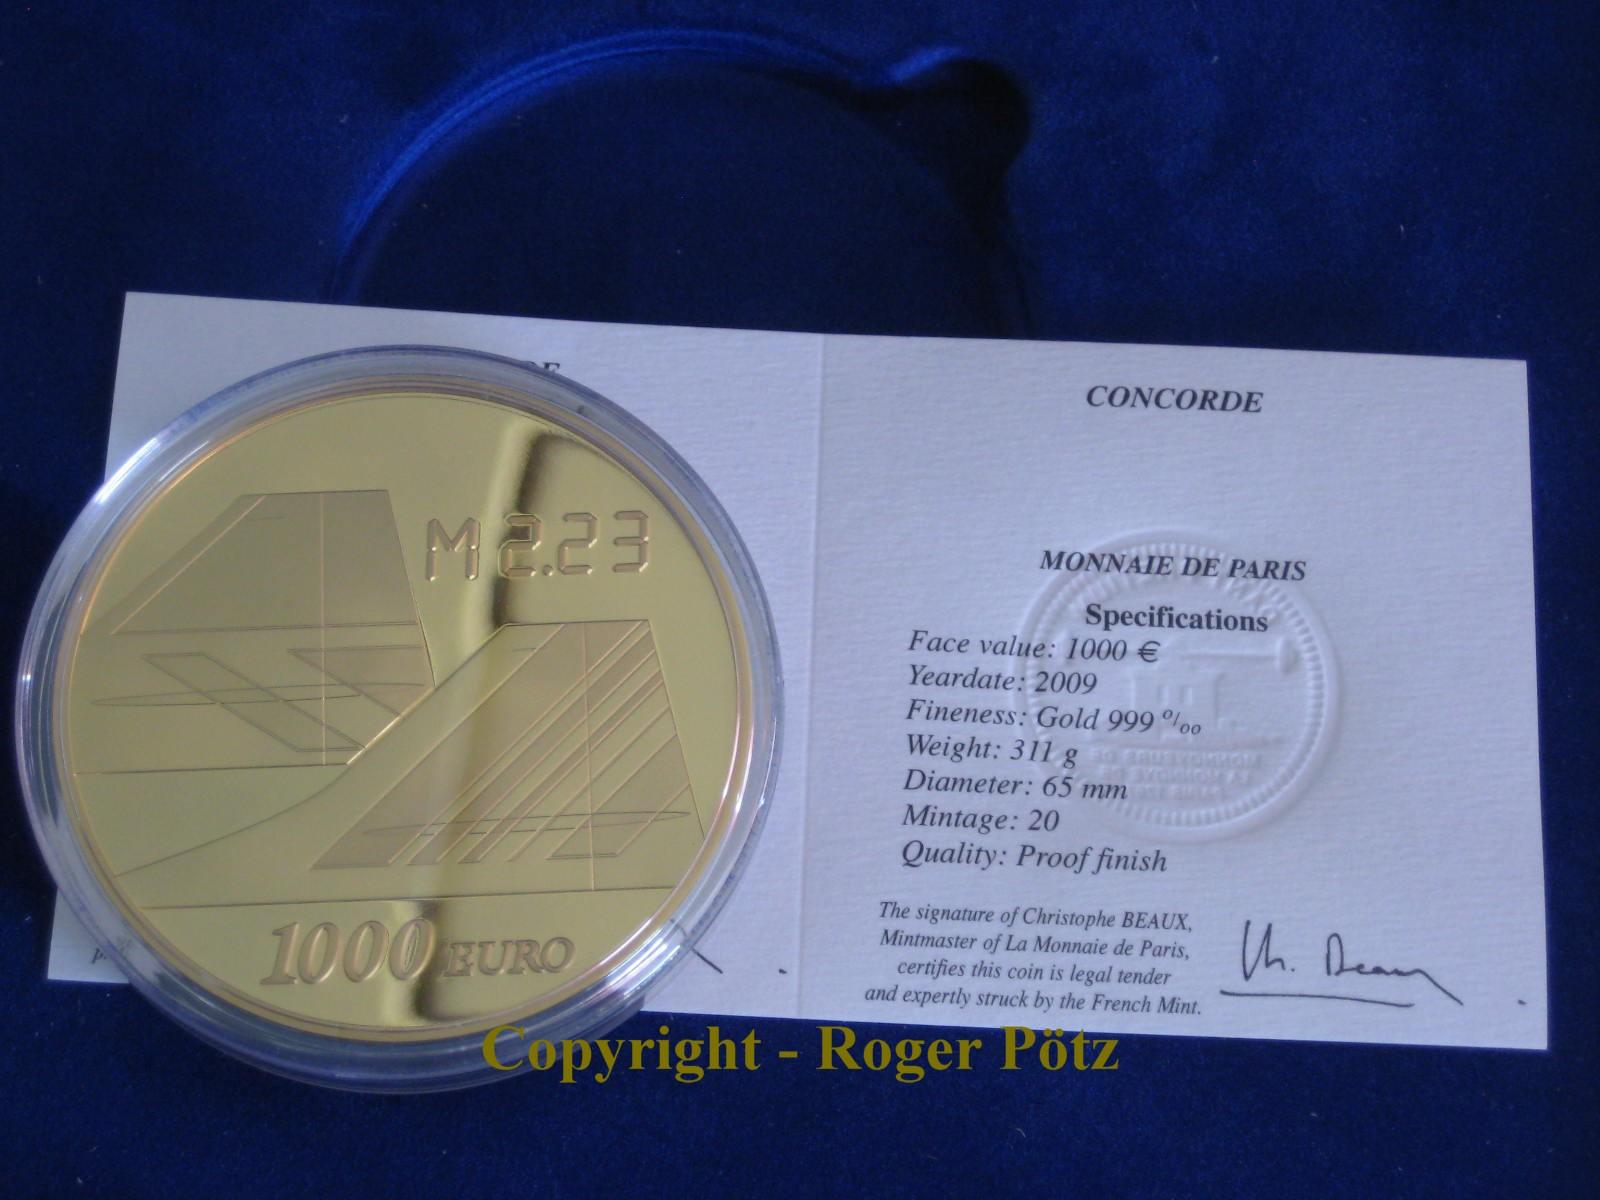 FRANKREICH 1000 Euro 2008 Concorde 10 Unzen Gold PP 2009 PP